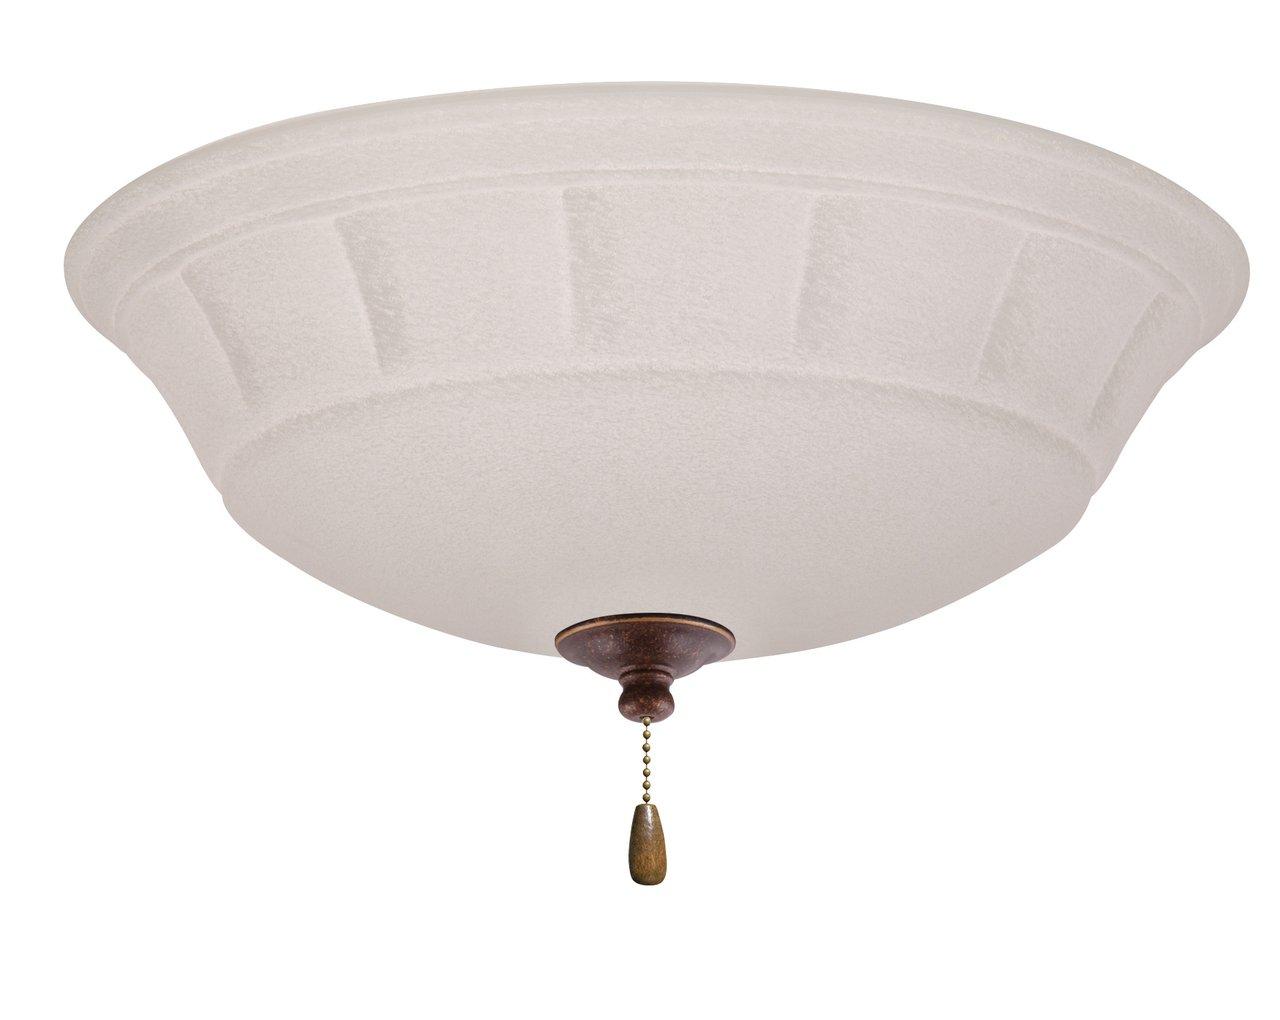 Emerson Ceiling Fans LK141GBZ Grande White Mist Ceiling Fan Light Fixture